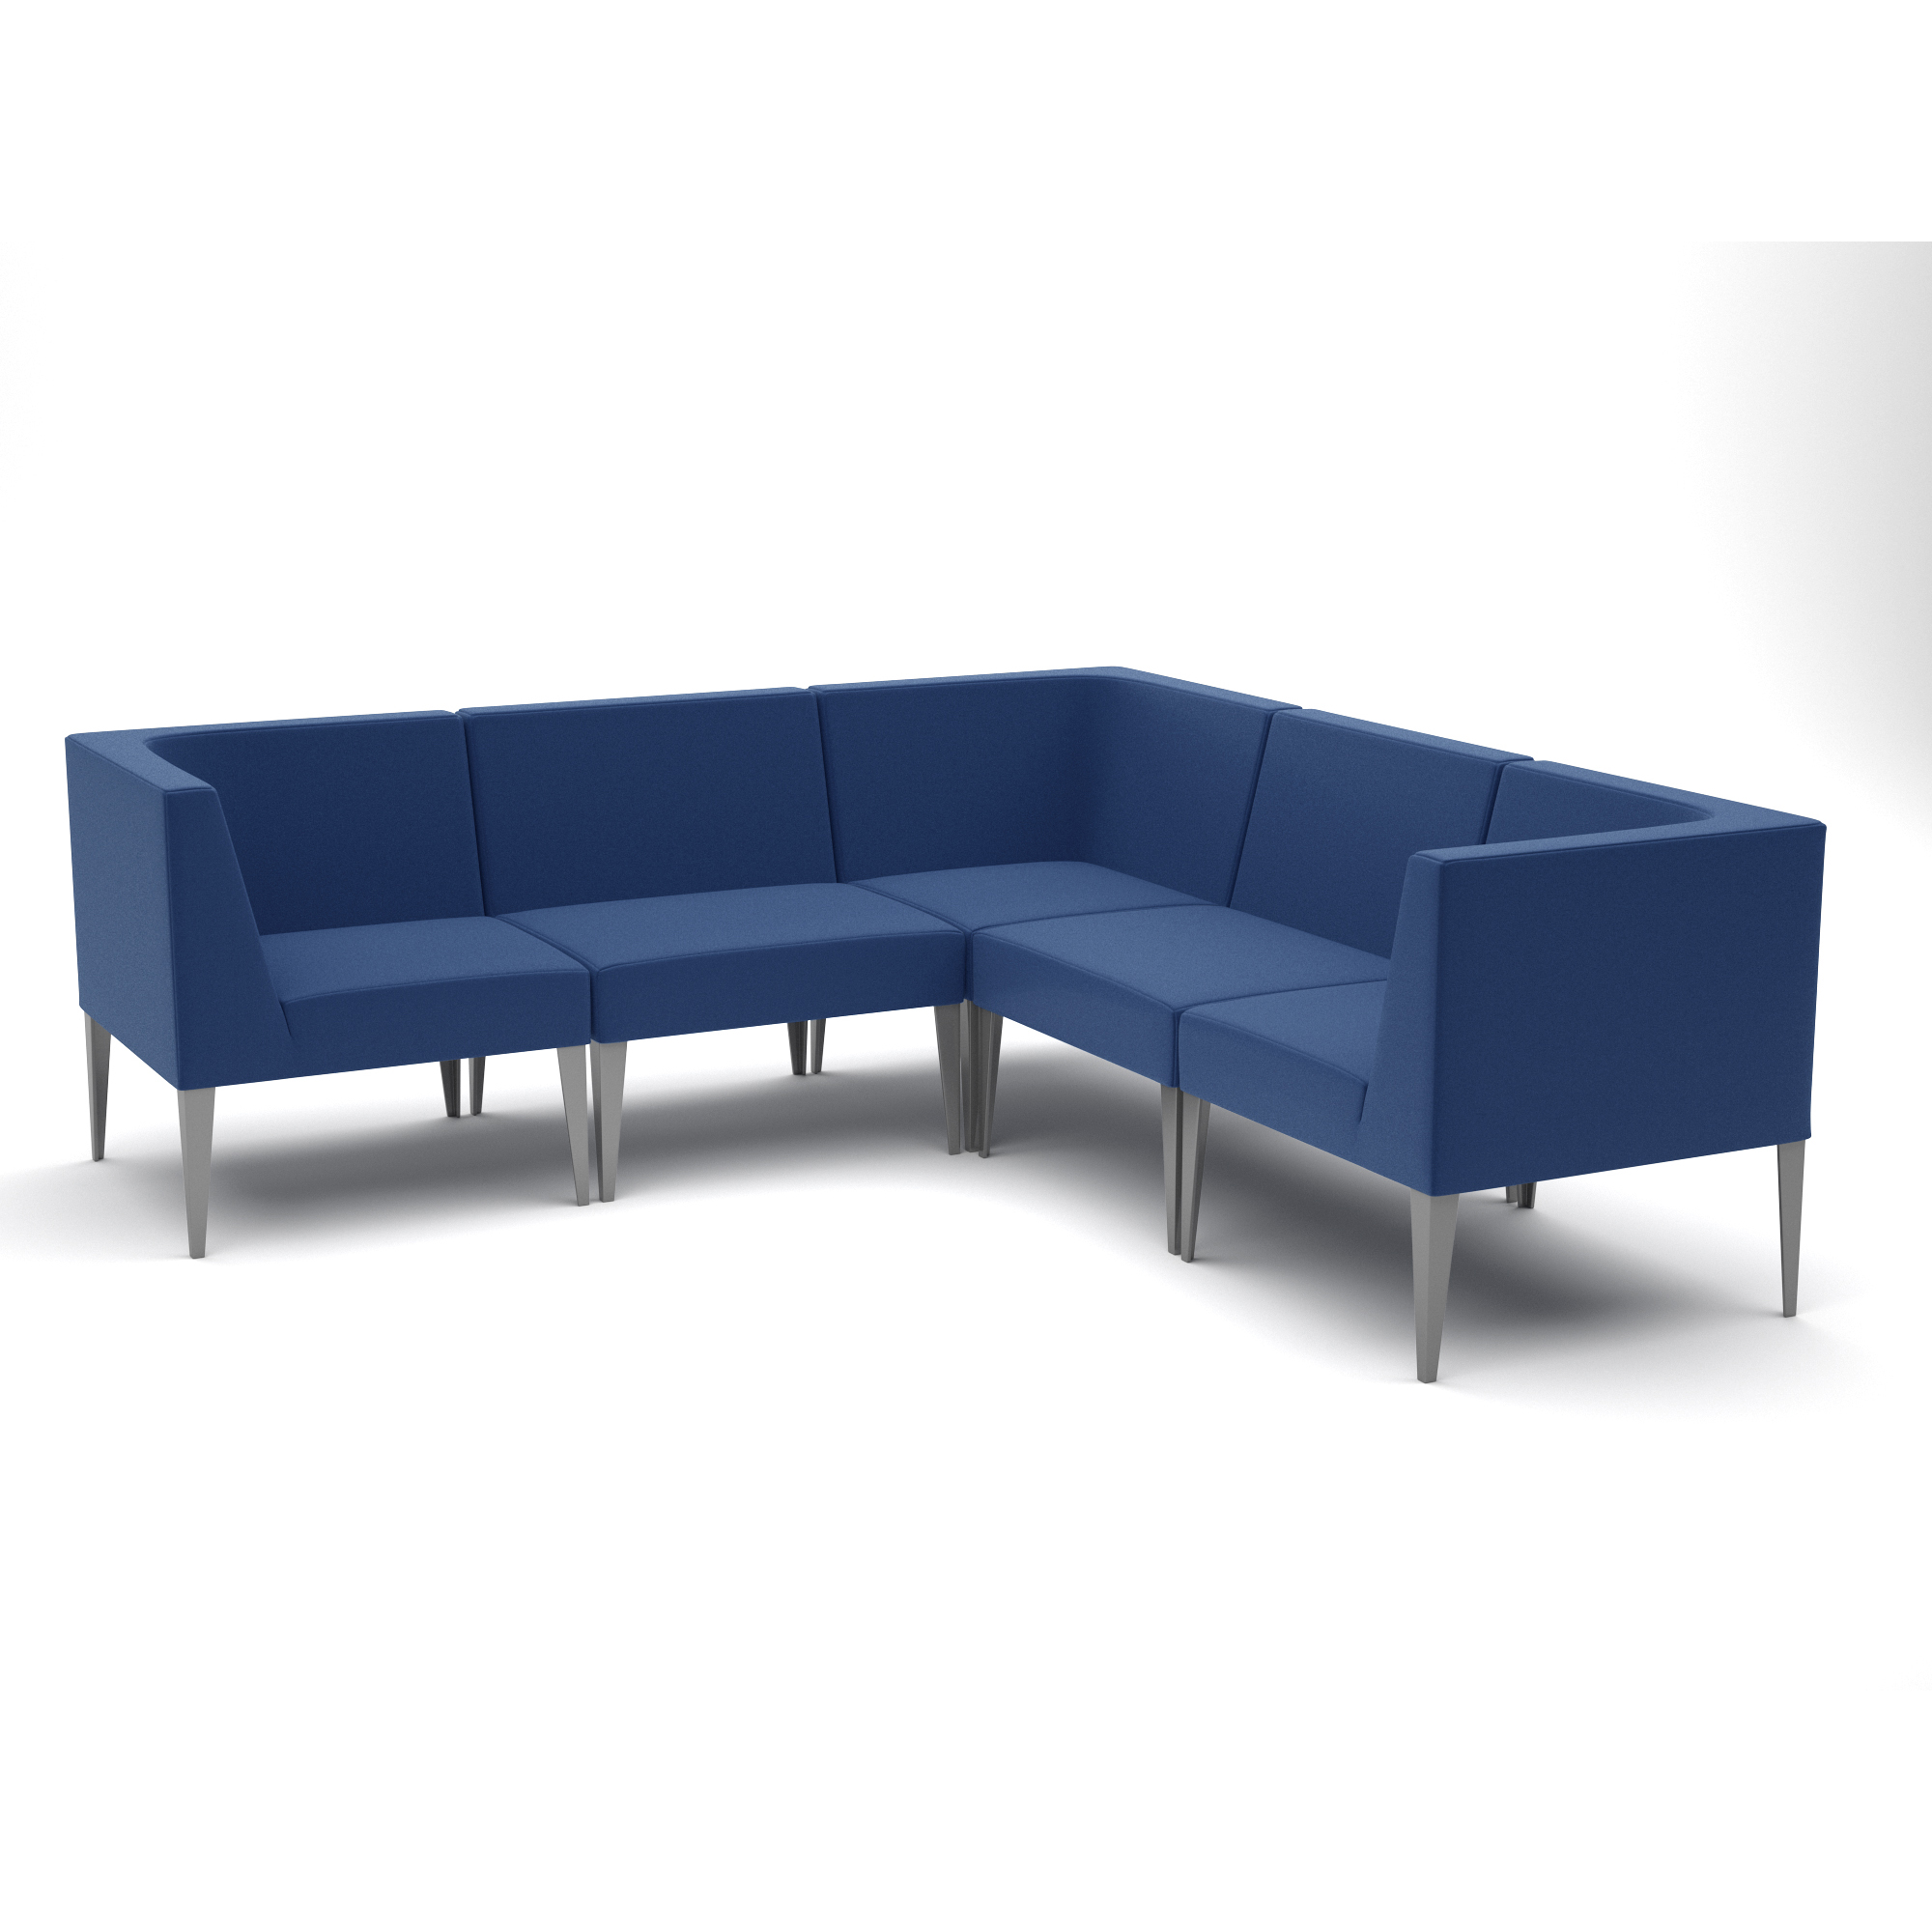 04S_Estel_Comfort&Relax_Sofa&Armchair_More-Club